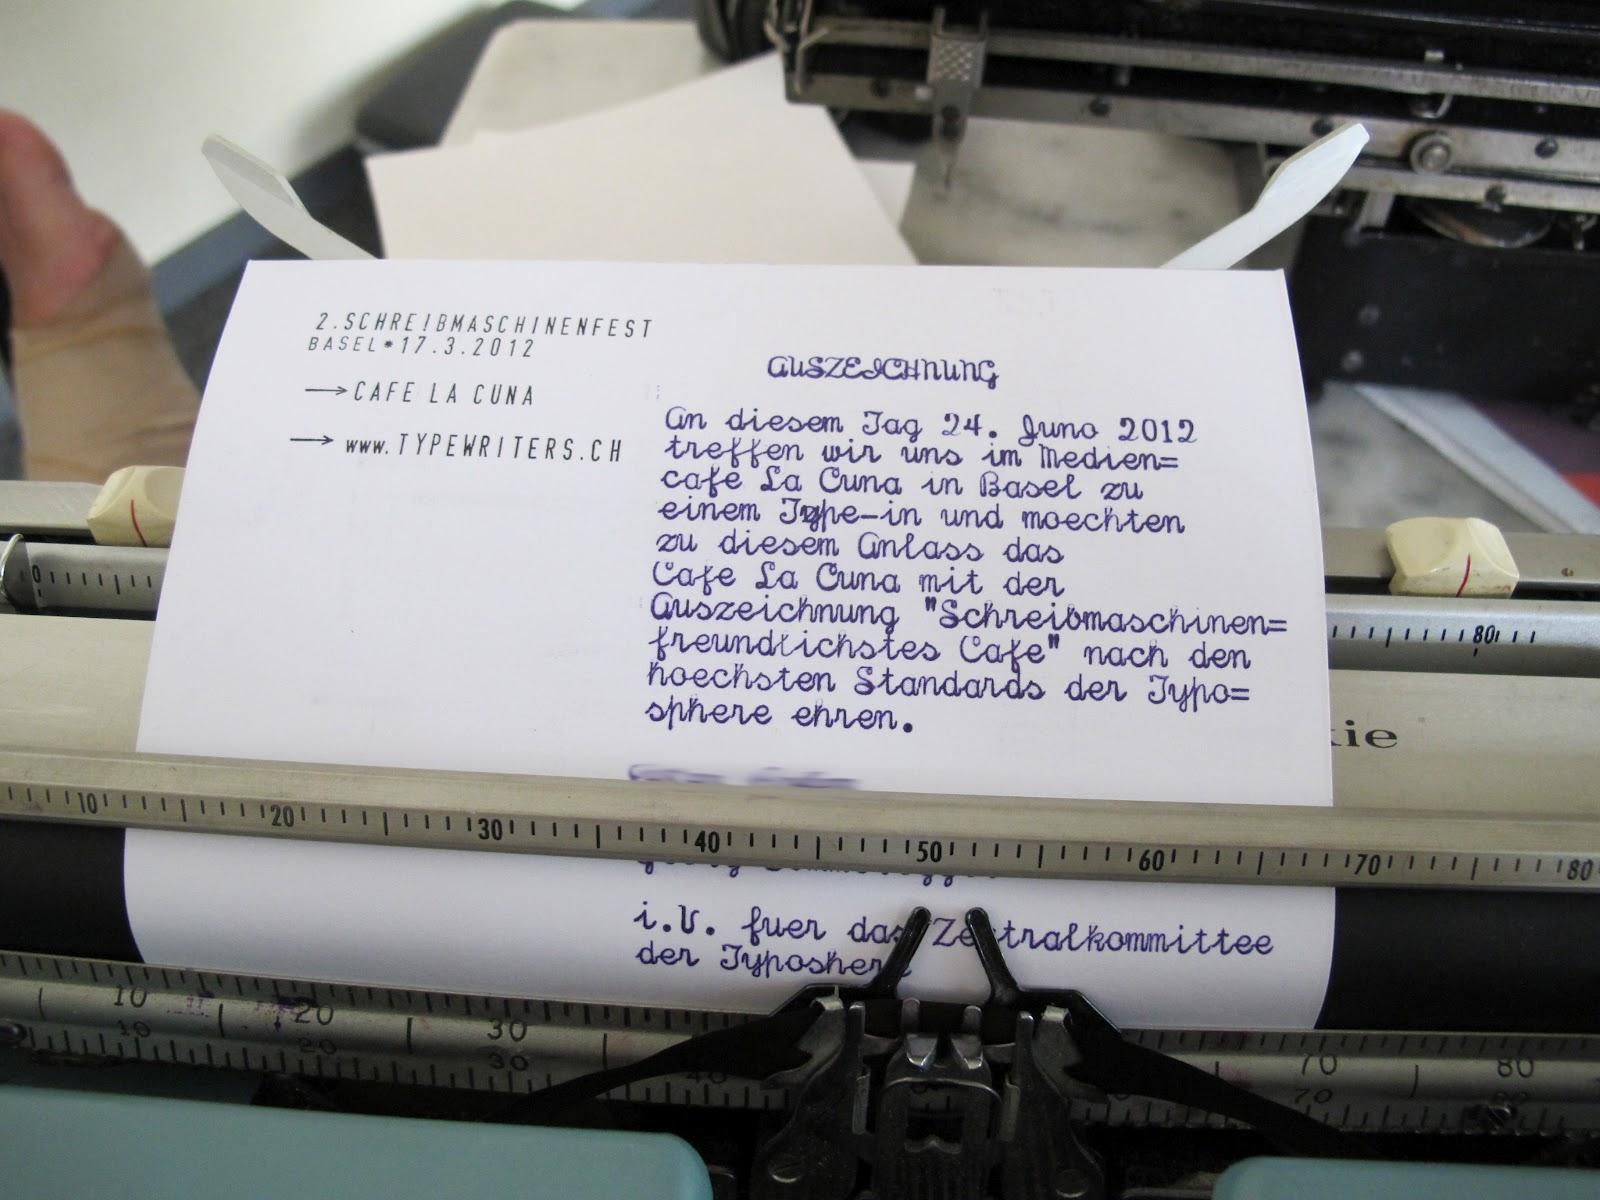 sea doo gtx xp hx 1997 factory service repair manual download pdf